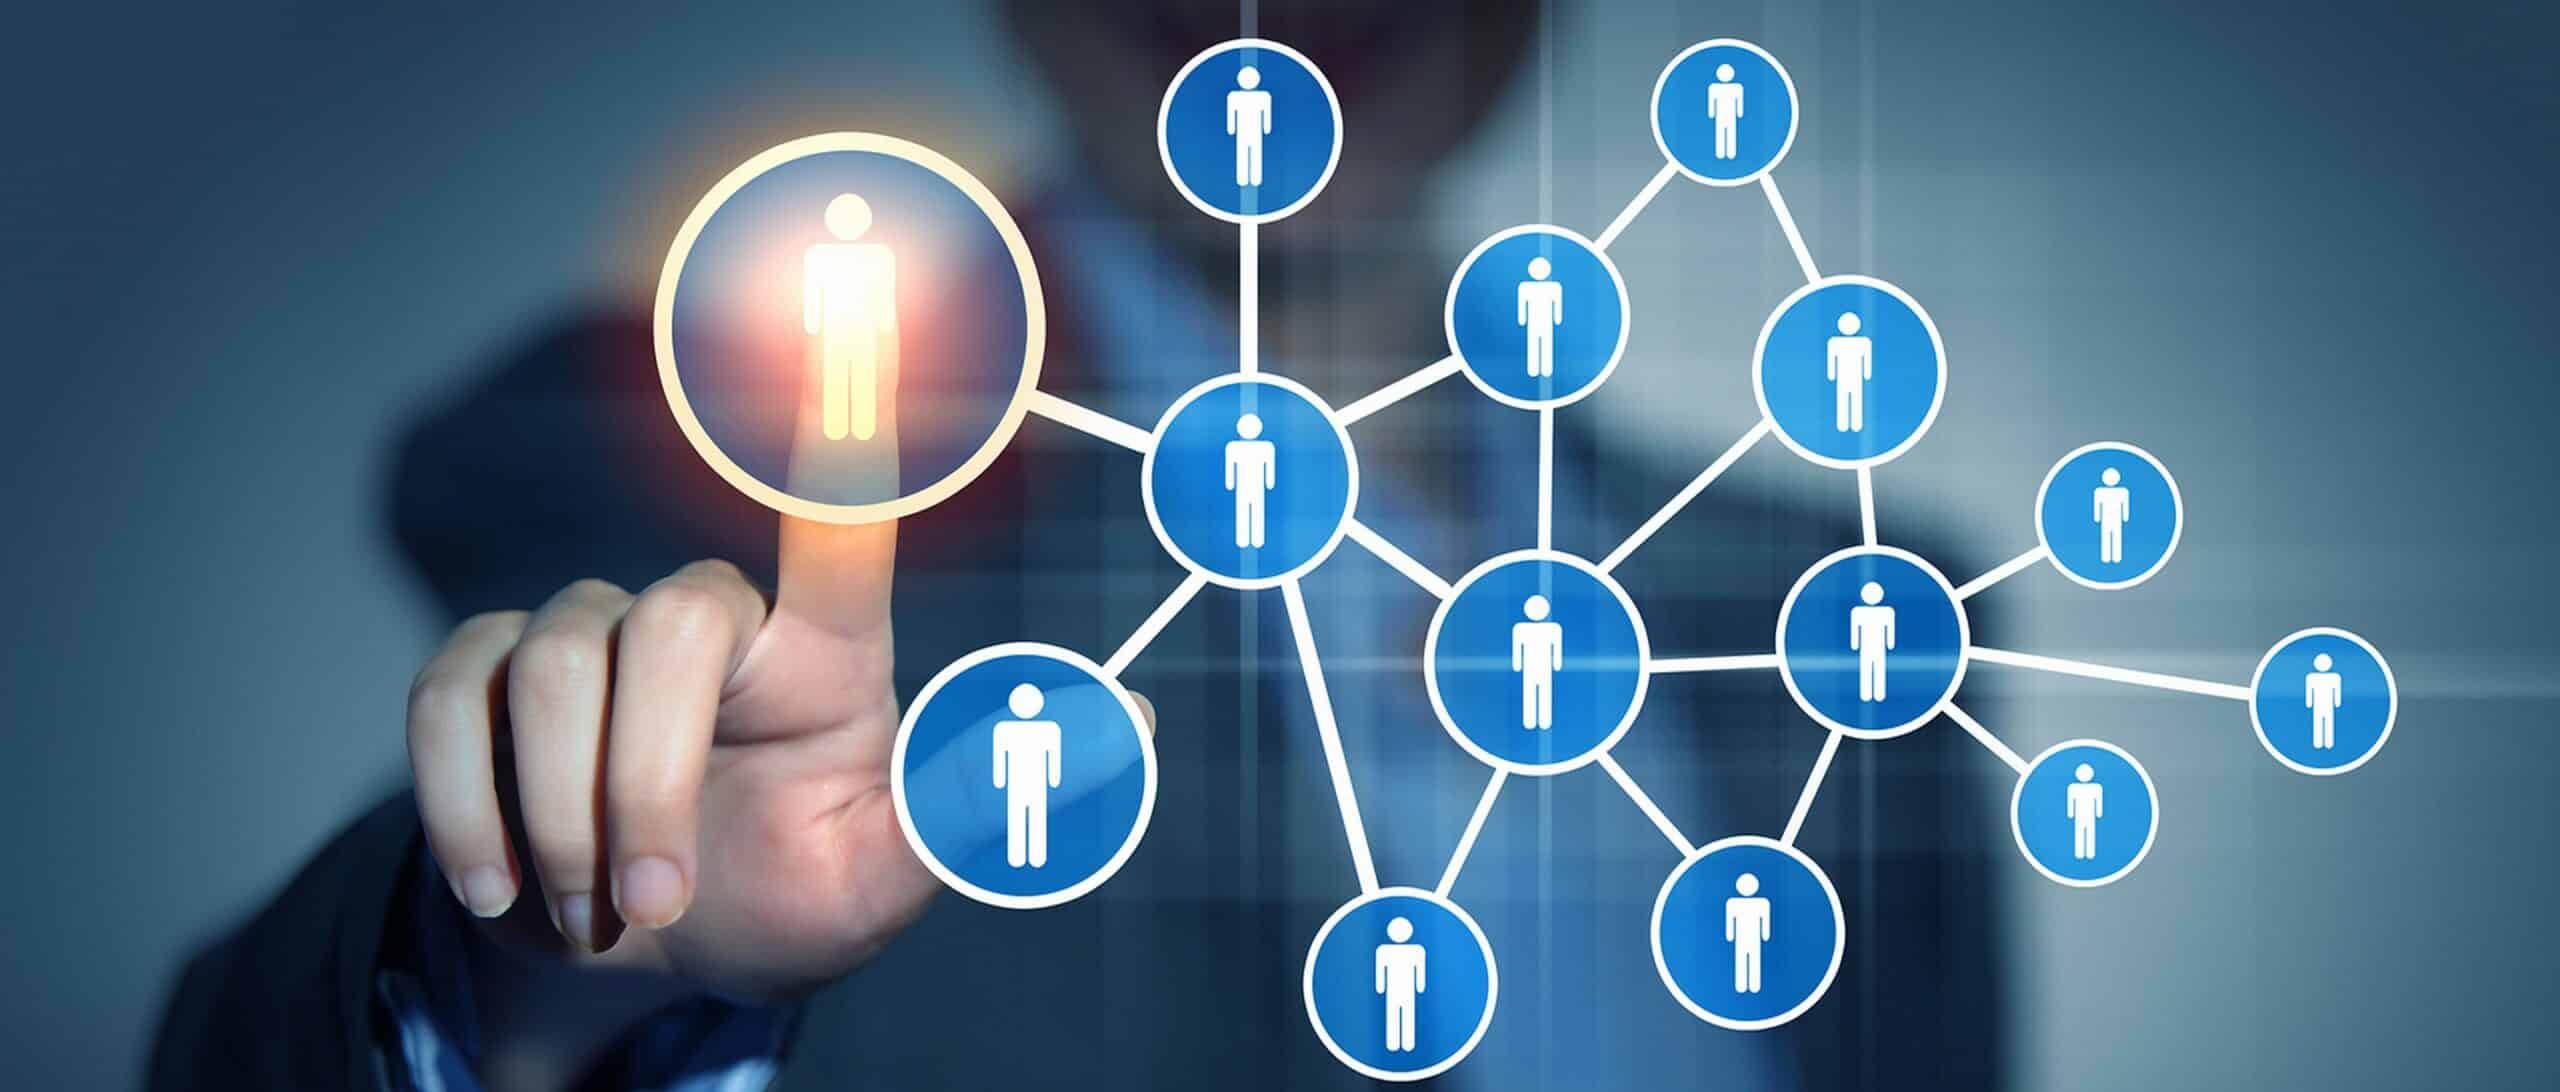 entrepreneur 4 صفات شخصية تجعلك مديرا ناجحا